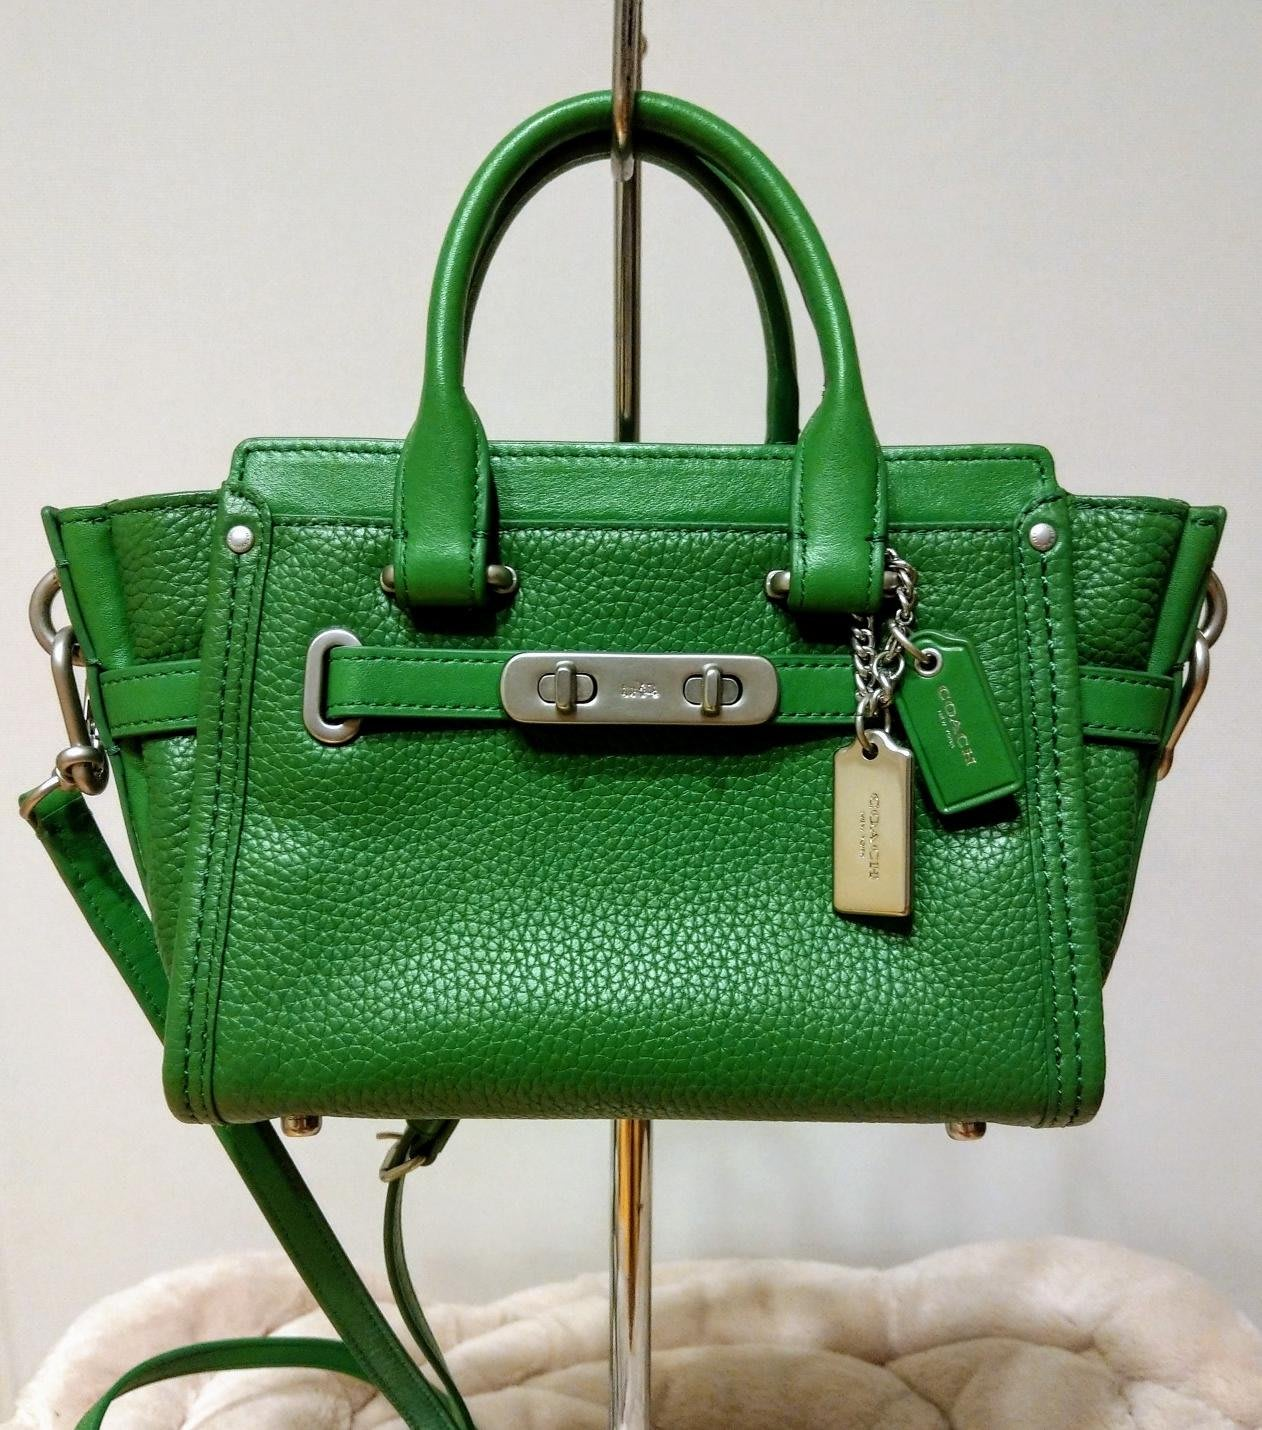 COACH (全新)S wagger 35798 翠綠荔枝紋手提包 斜背包 兩用包 mini 皮包